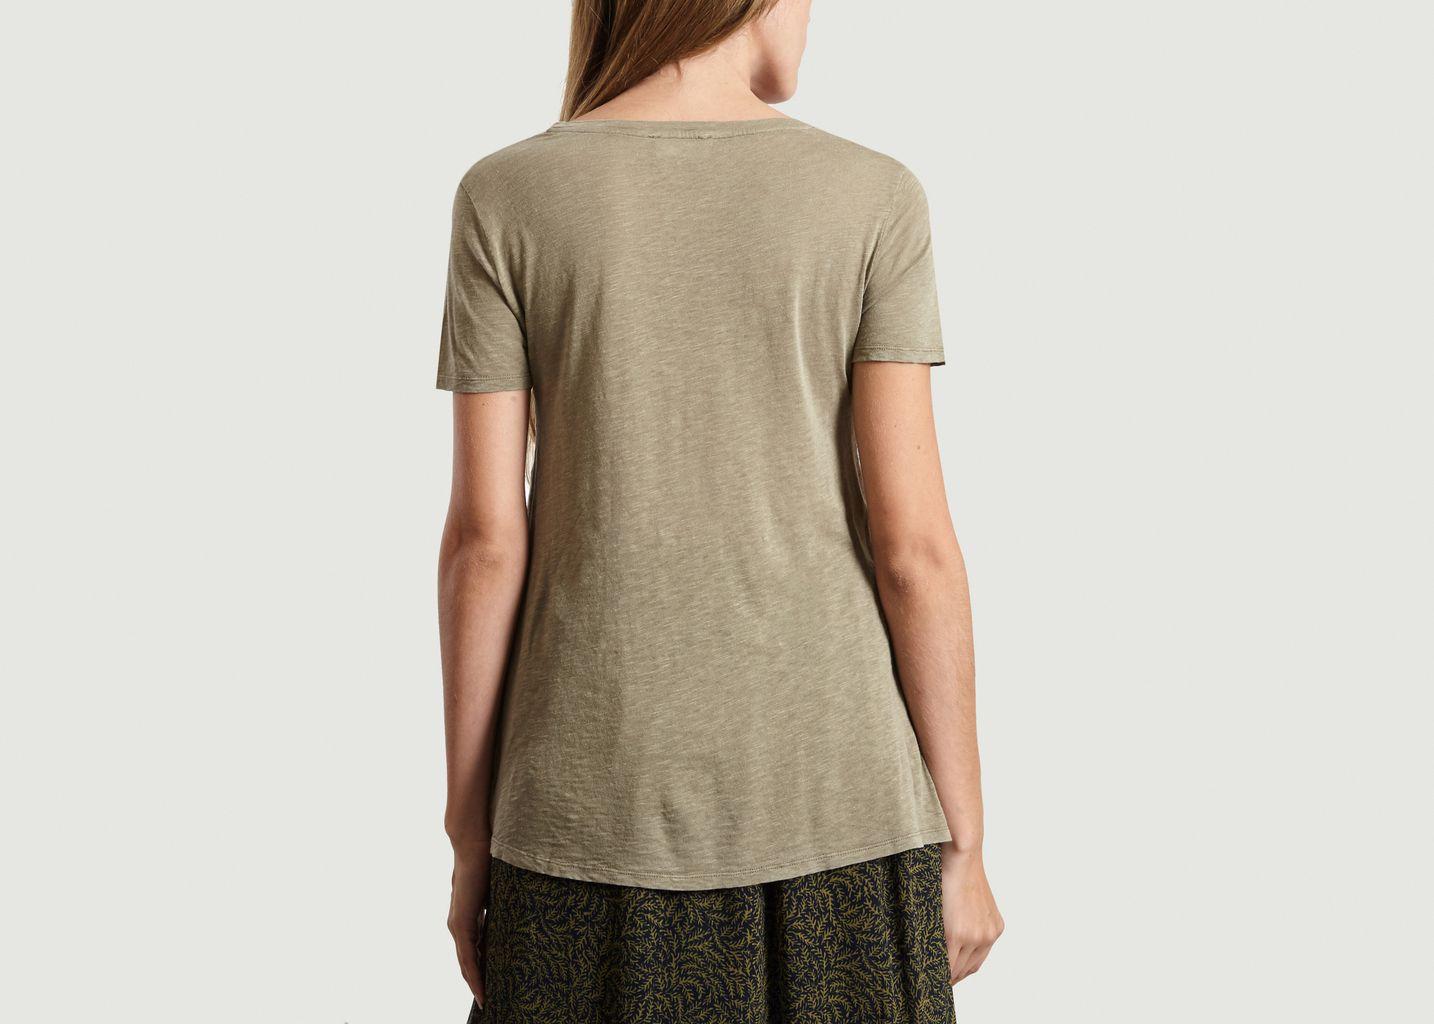 T-shirt Kobibay - American Vintage